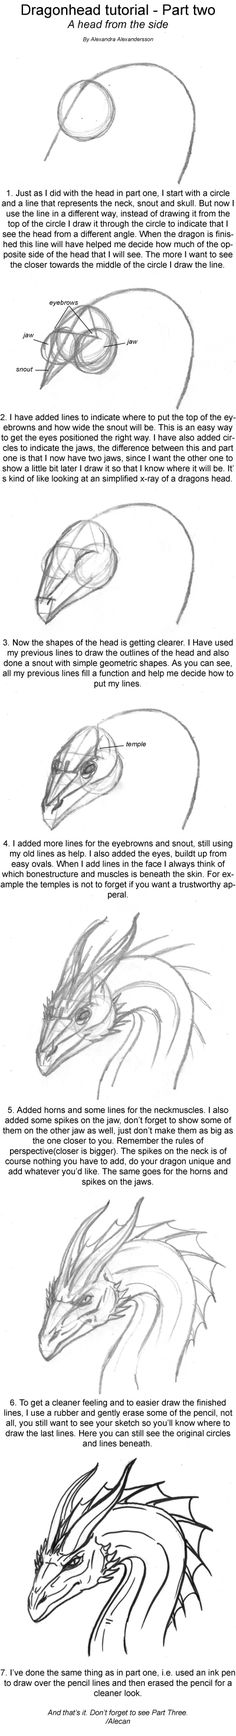 Dragonhead Tutorial part two by alecan.deviantart.com on @deviantART